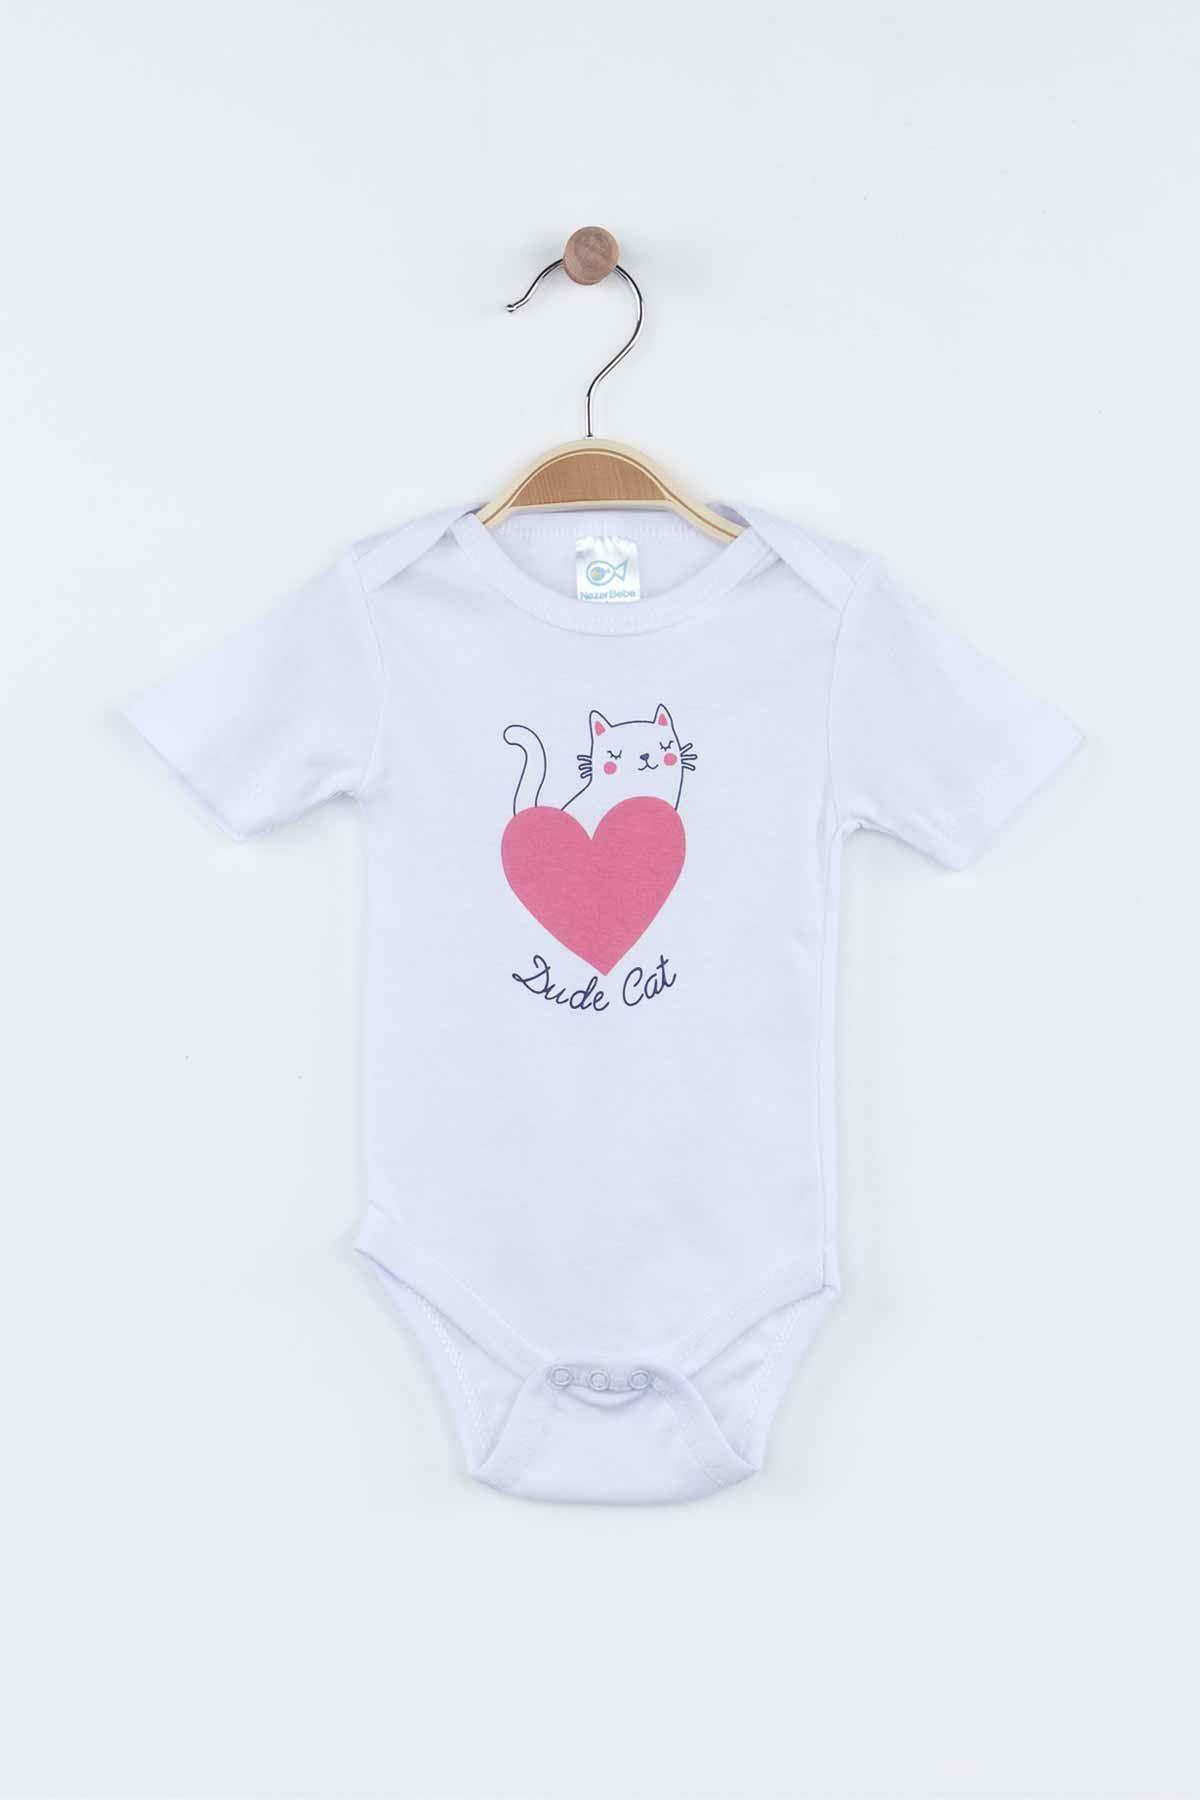 Pembe Mevsimlik Kız Bebek Badili Takım